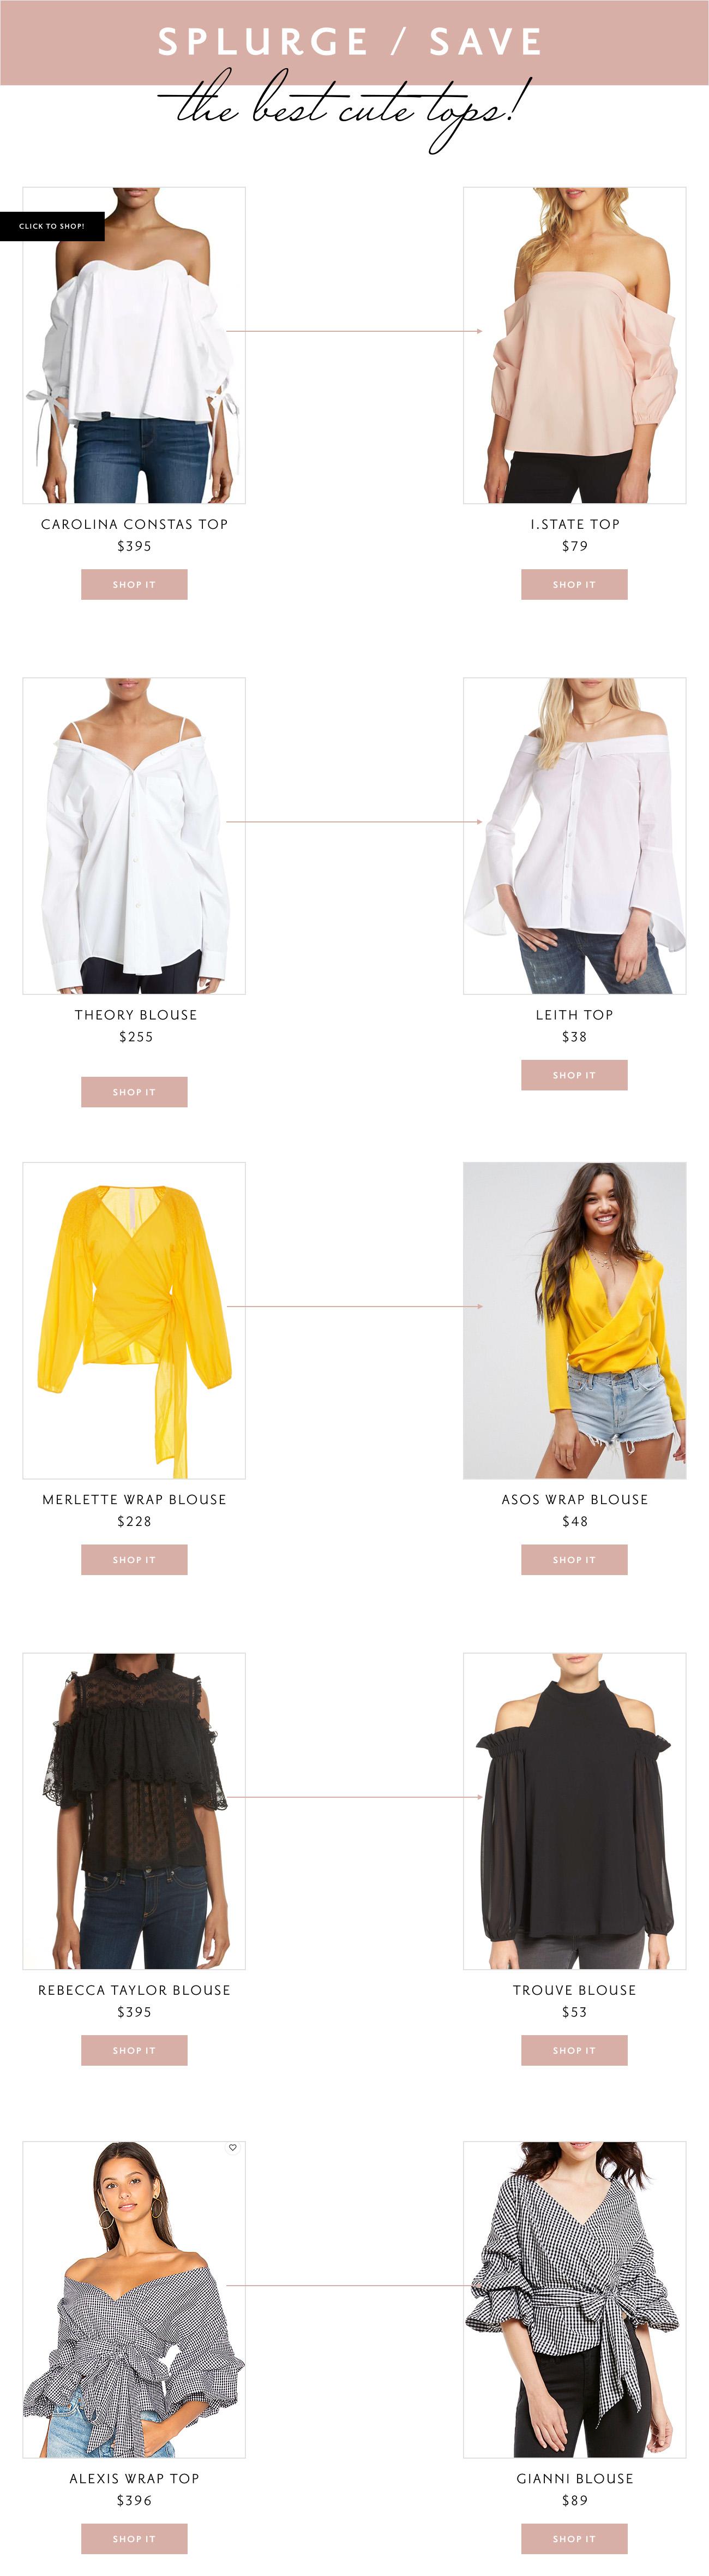 splurge vs. save: the best cute tops | the stripe blog